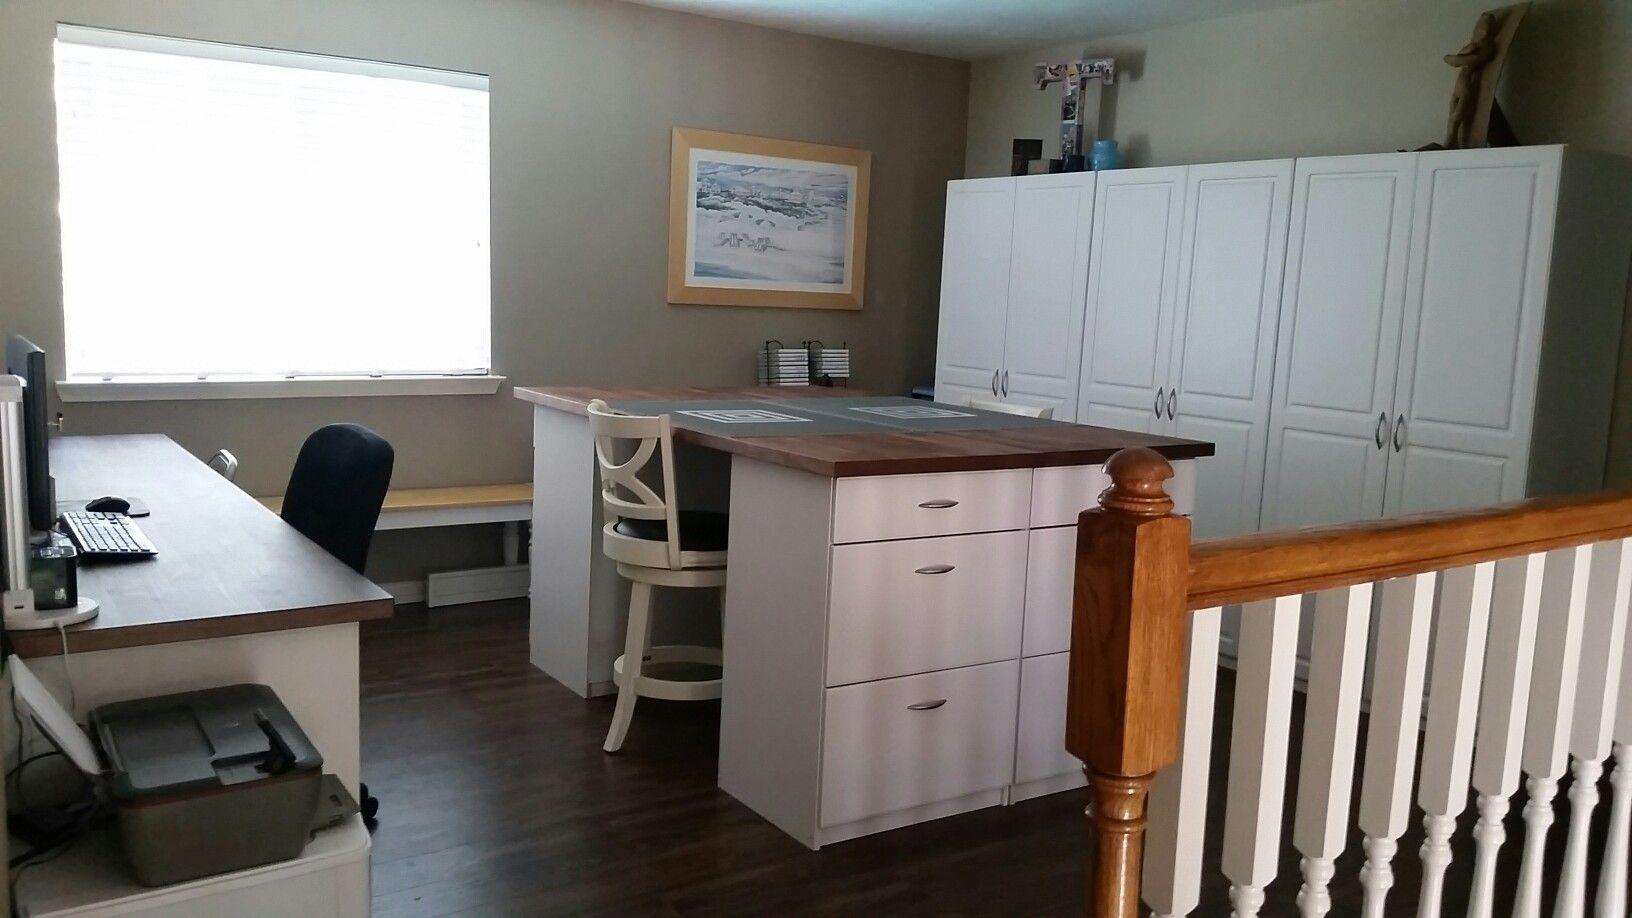 My Happy Place Desk Is 98 Ikea Karlby Countertop In Walnut Plus 3 Alex Drawer Units 2 With Drop File Craft Isl Desk Storage Room Storage Diy Craft Storage